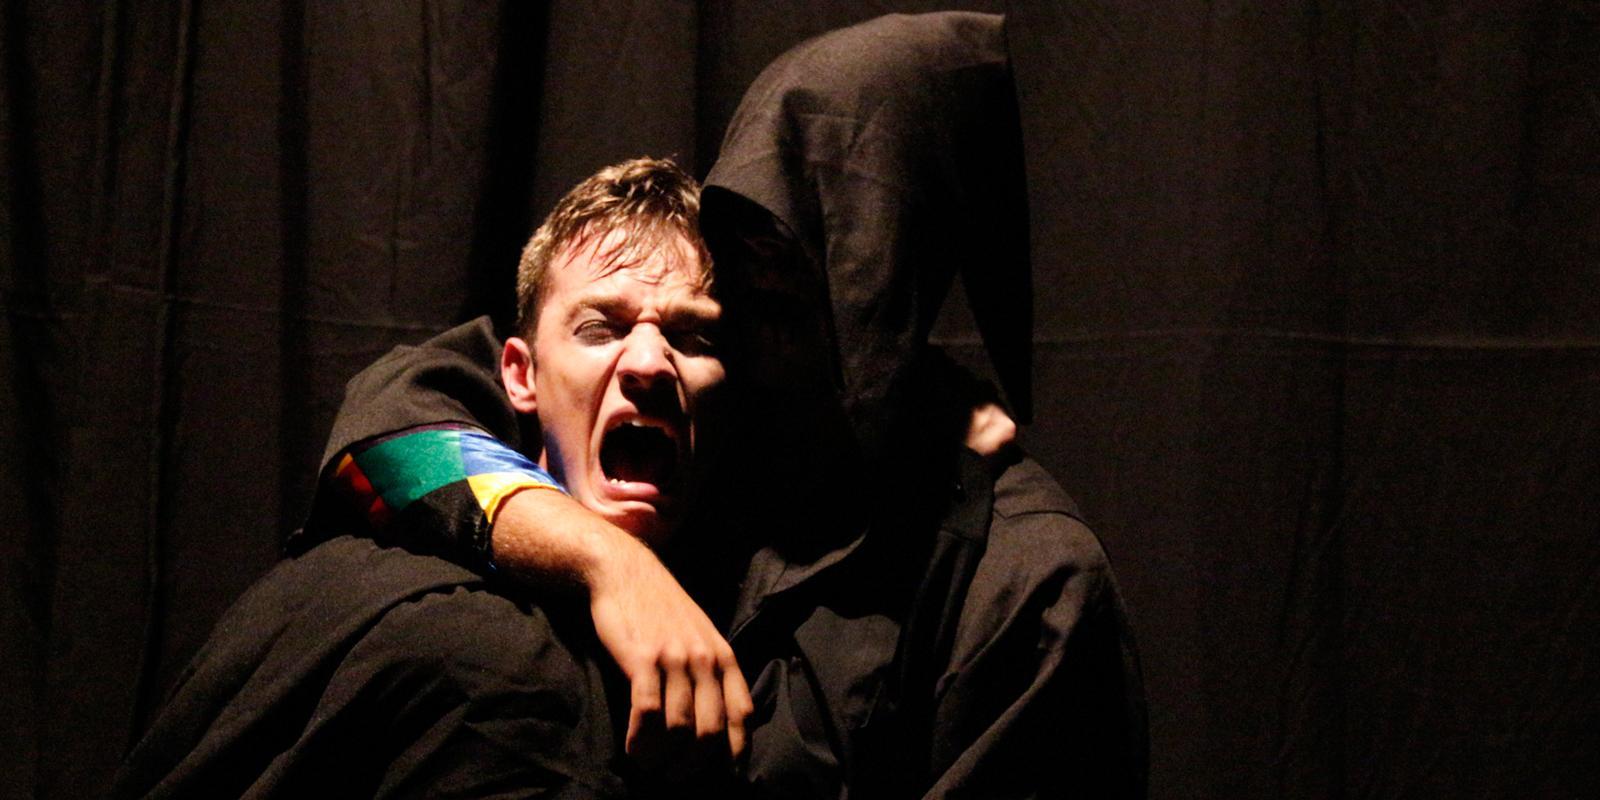 Teatro UNIFAAT se apresenta no Festival de Inverno de Atibaia